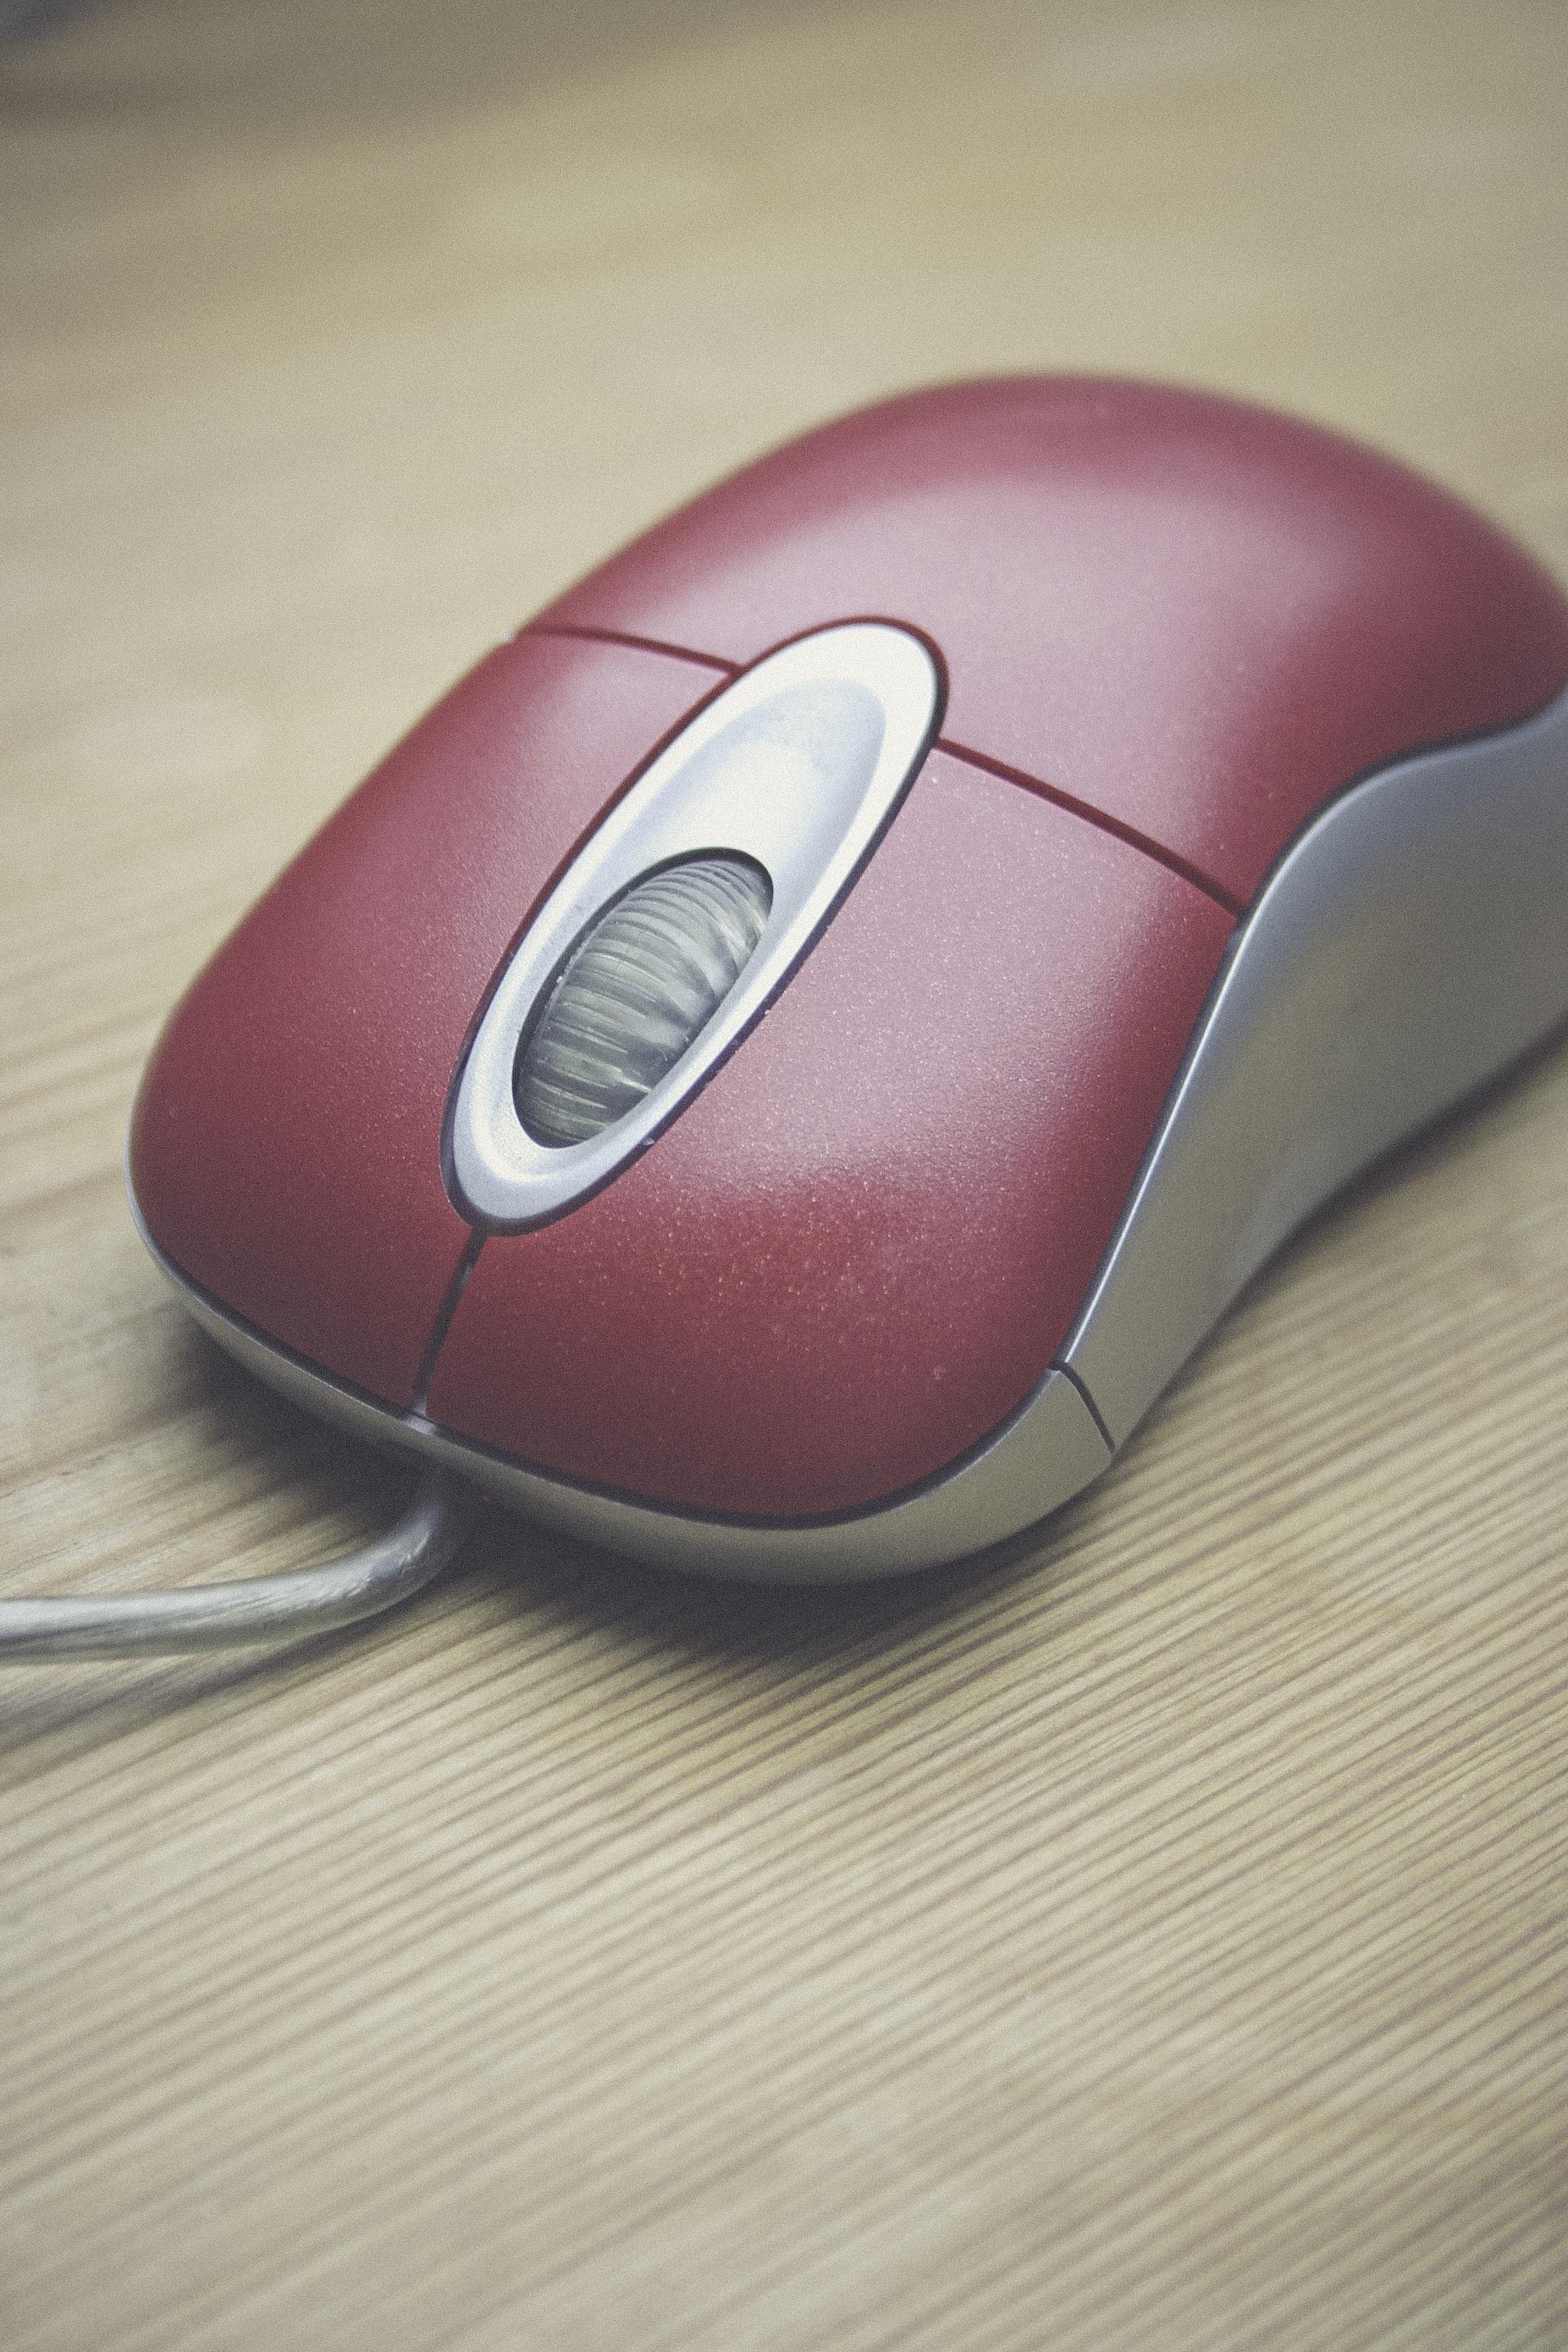 mousenew